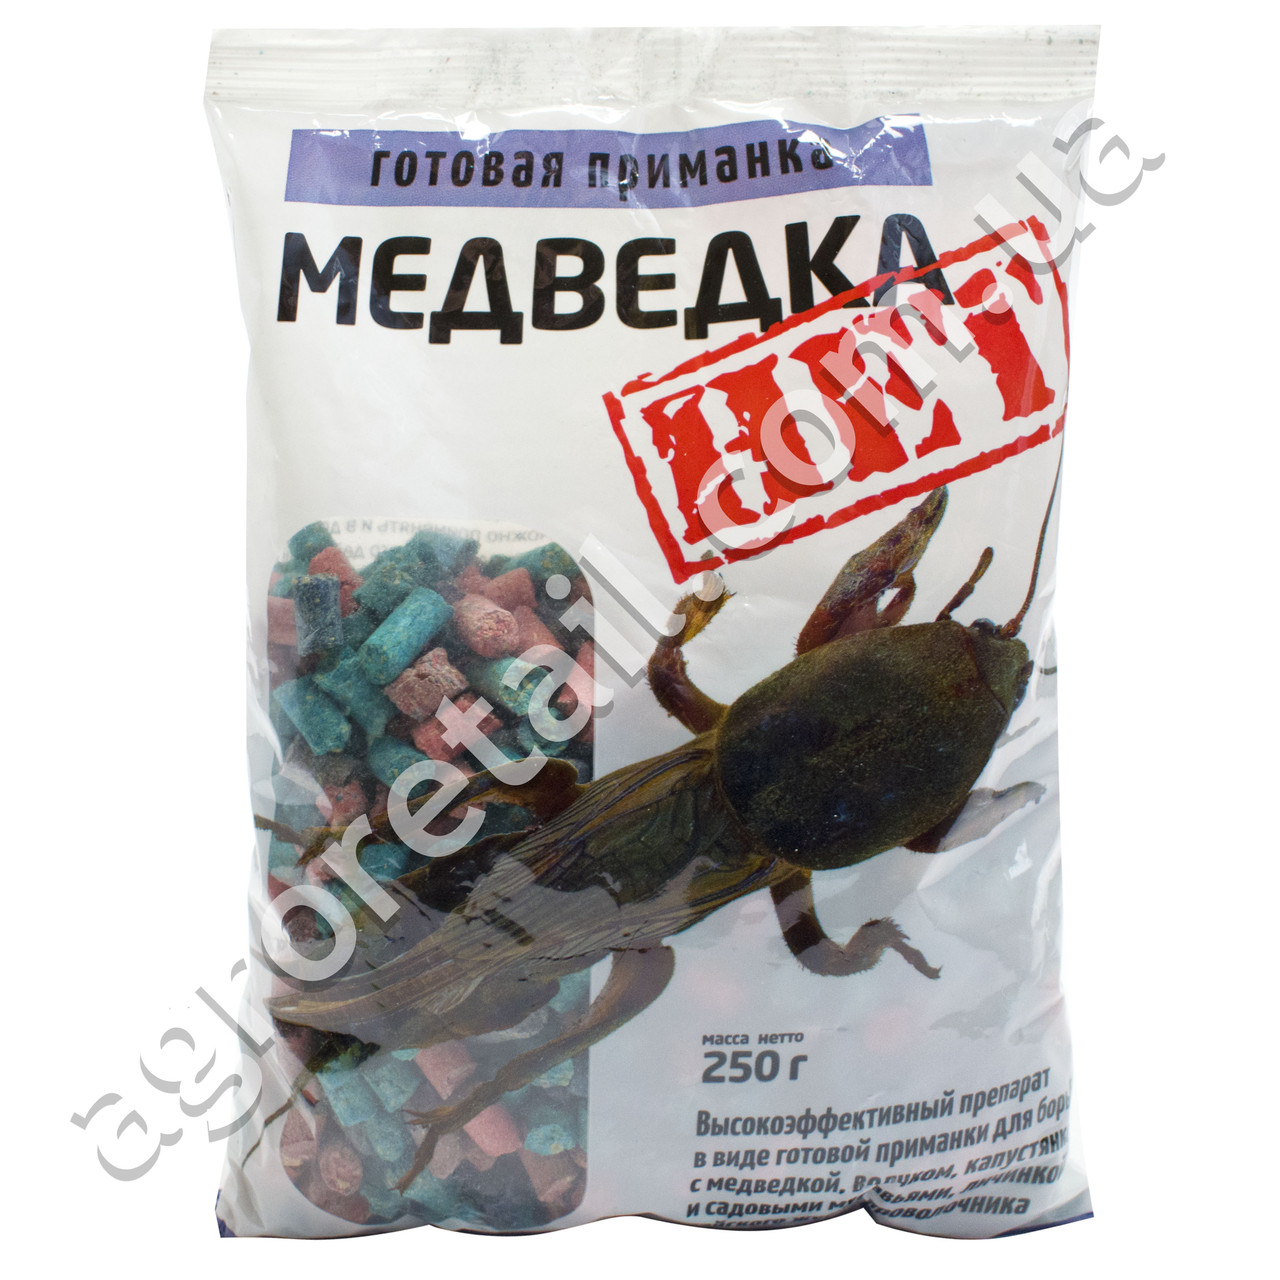 Инсектицид Медведка нет гранула 250 г